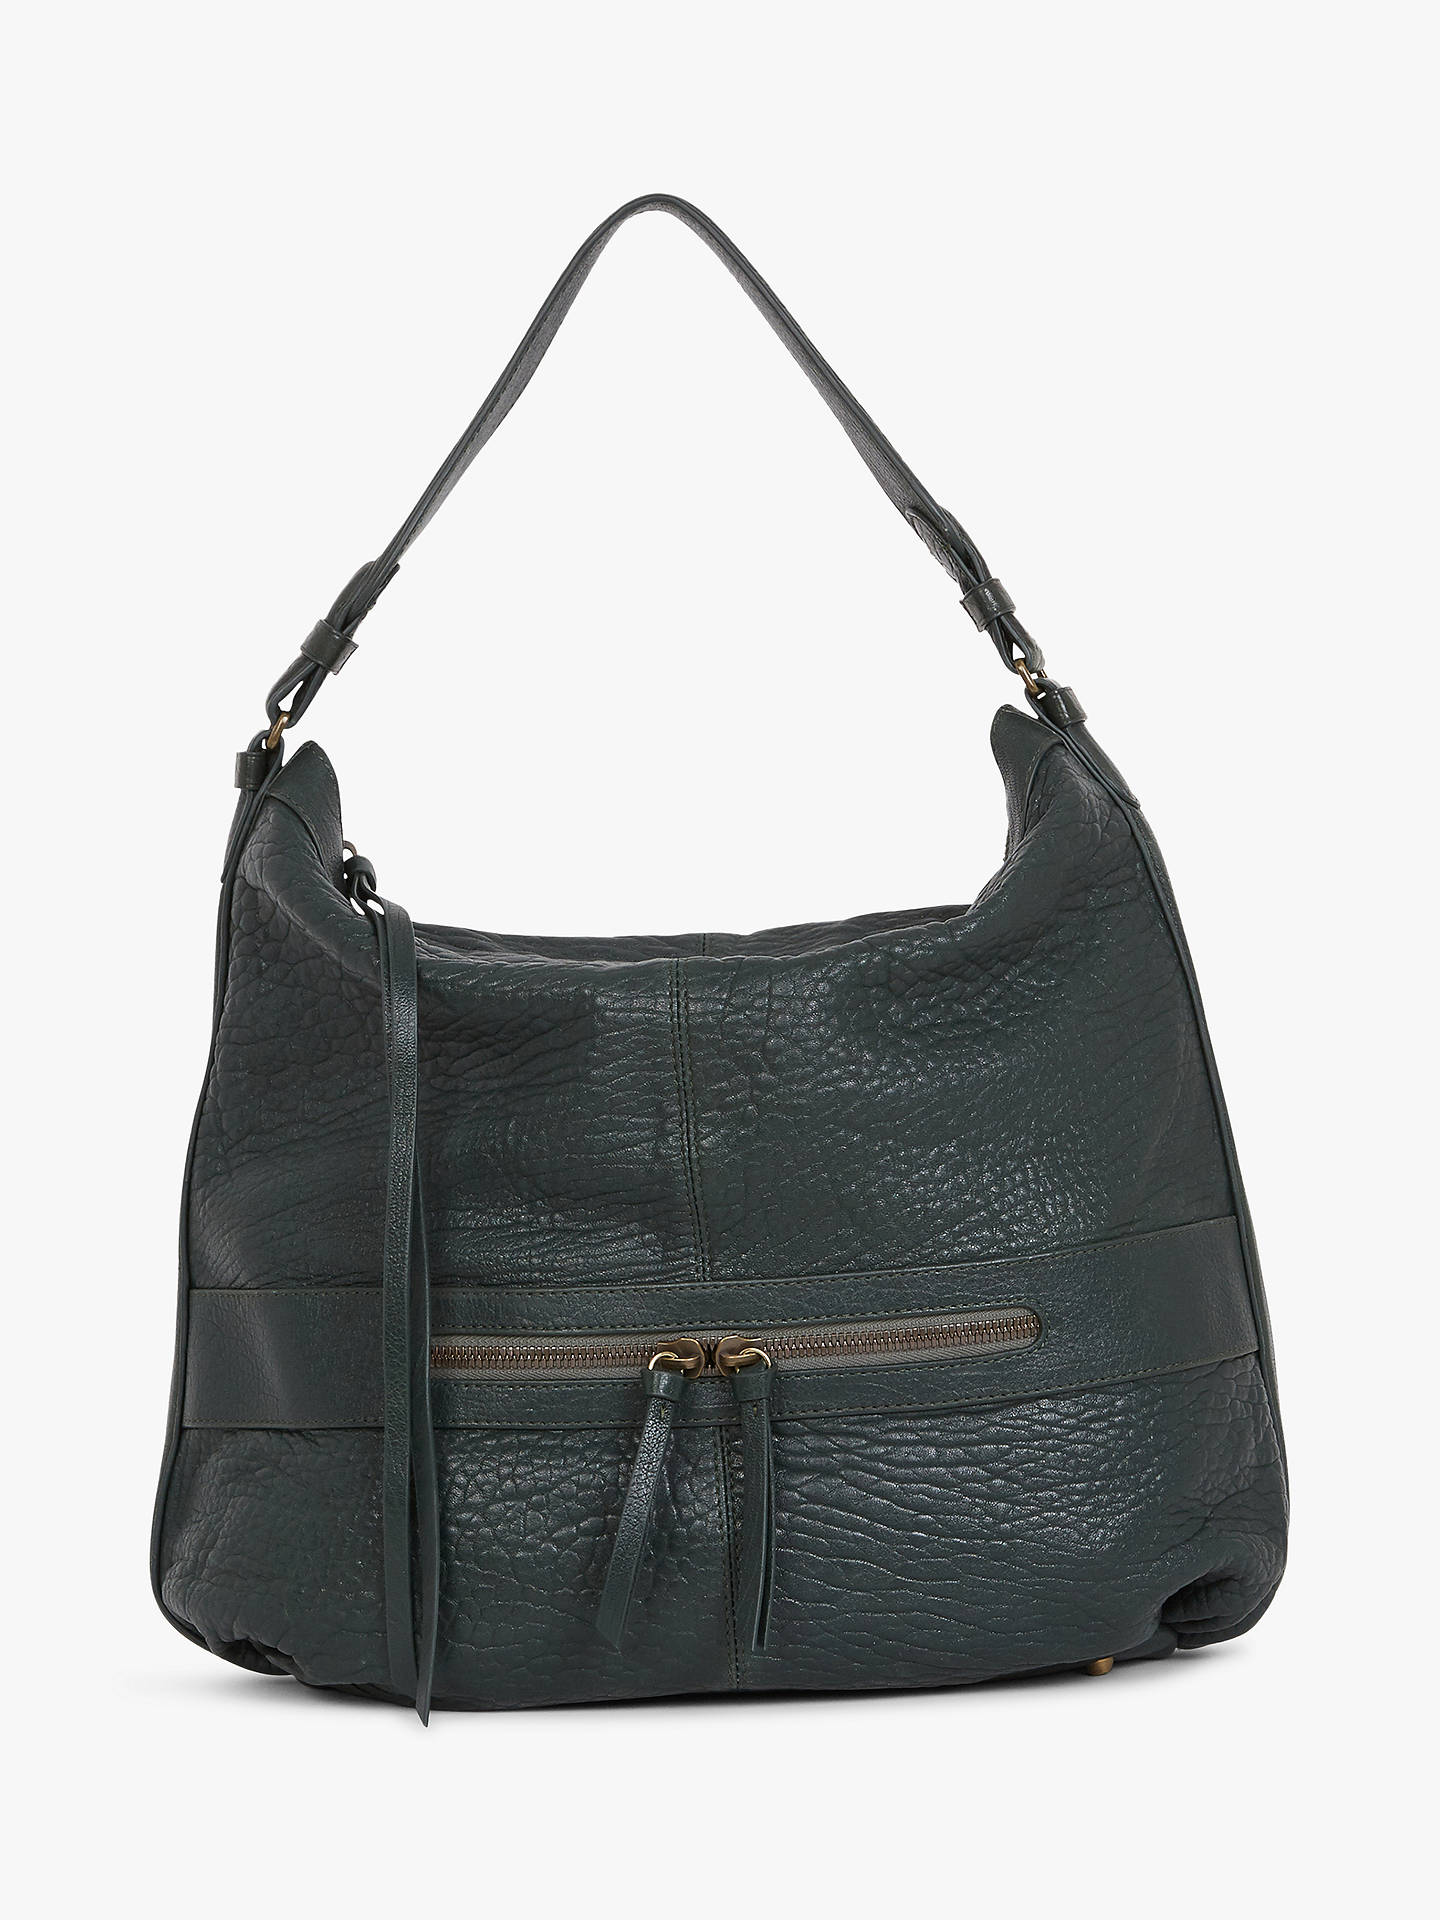 34fd30503f Buy Gerard Darel Midday GD Tassel Shoulder Bag